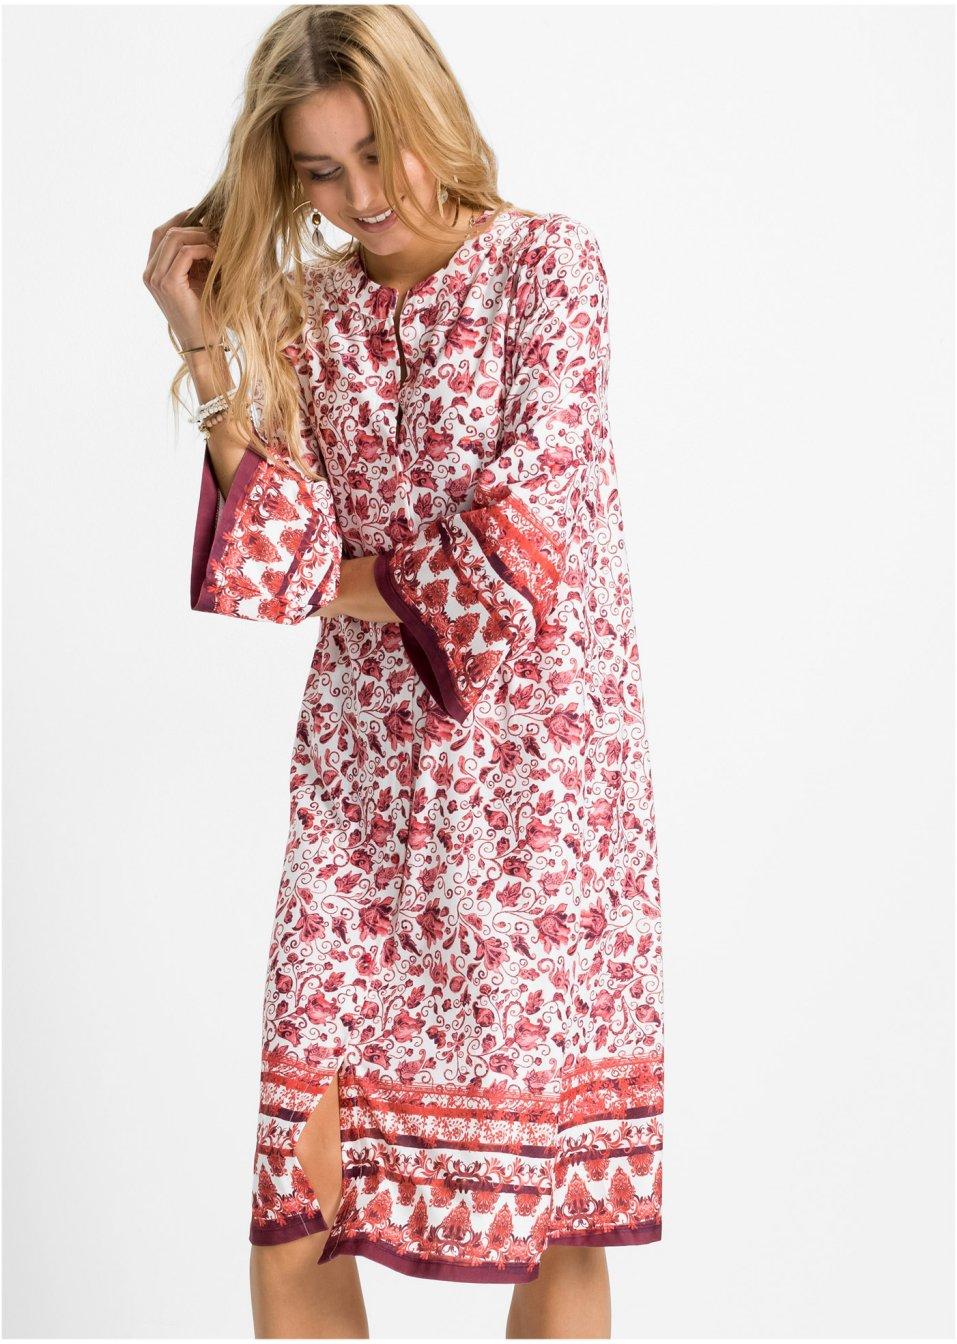 Mode Femme Vêtements DJLfdOFlkj Robe caftan rouge/rouge clair imprimé RAINBOW acheter online .fr